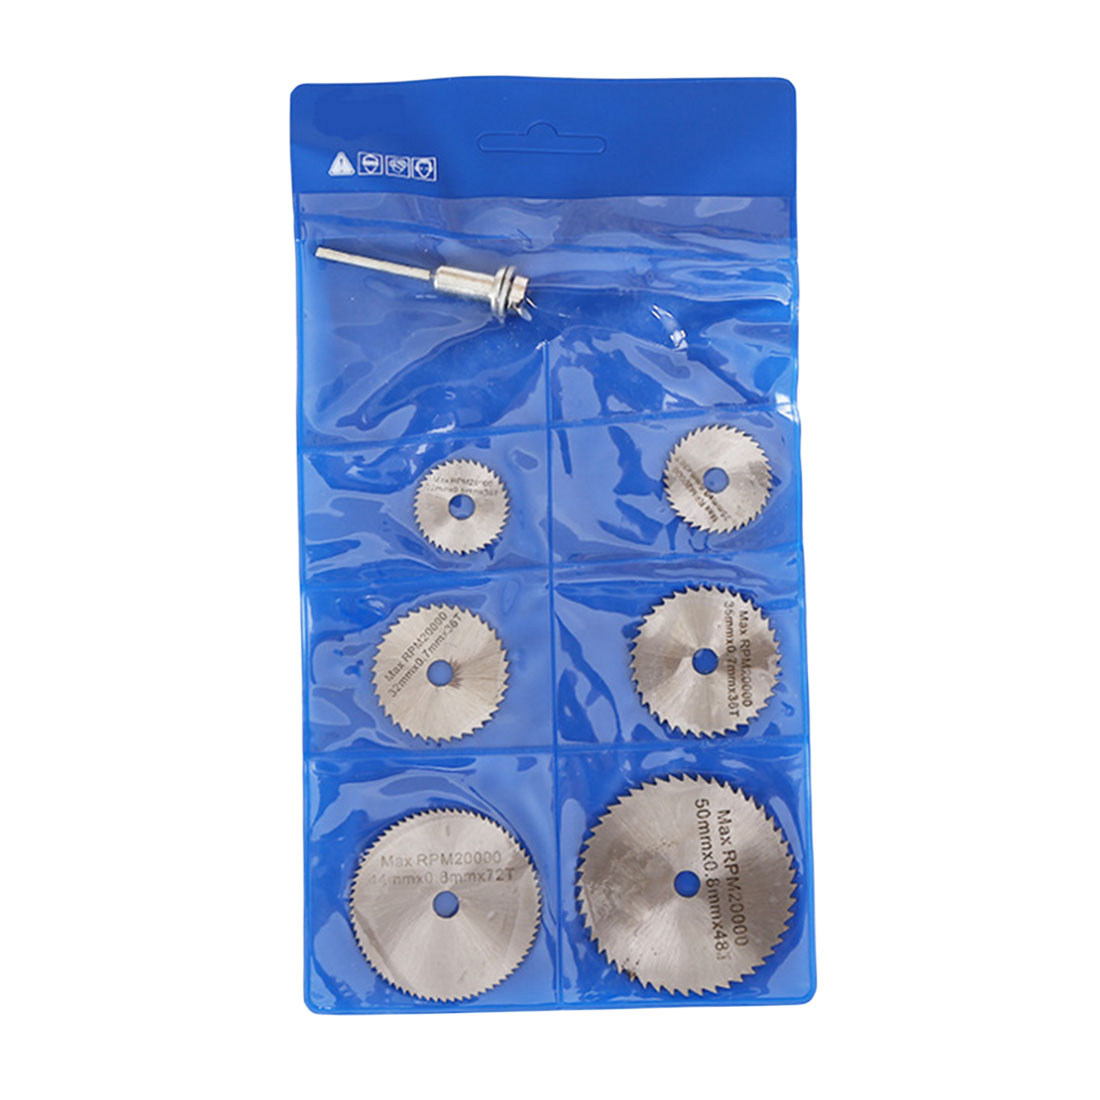 6PCS HSS Rotary Tool 22 /25 /32 /35 /44 /50mm Circular Saw Blades Cutting Discs Mandrel For Dremel Cut Off